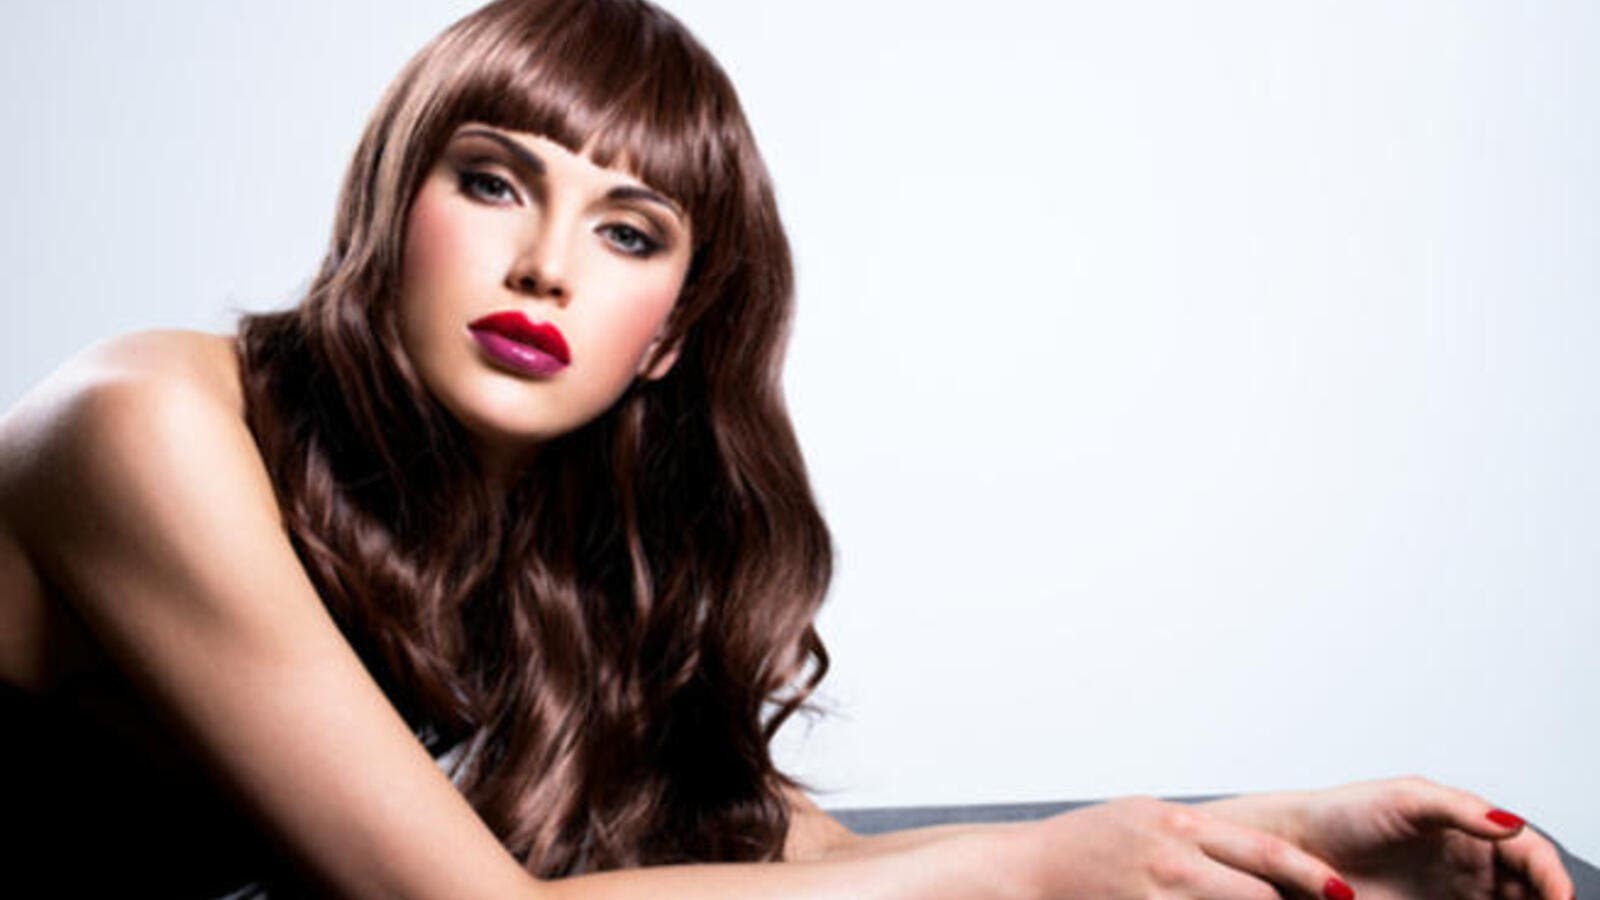 c888056727d93 أول 7 صفات جمالية تجذب انتباه الرجال في النساء